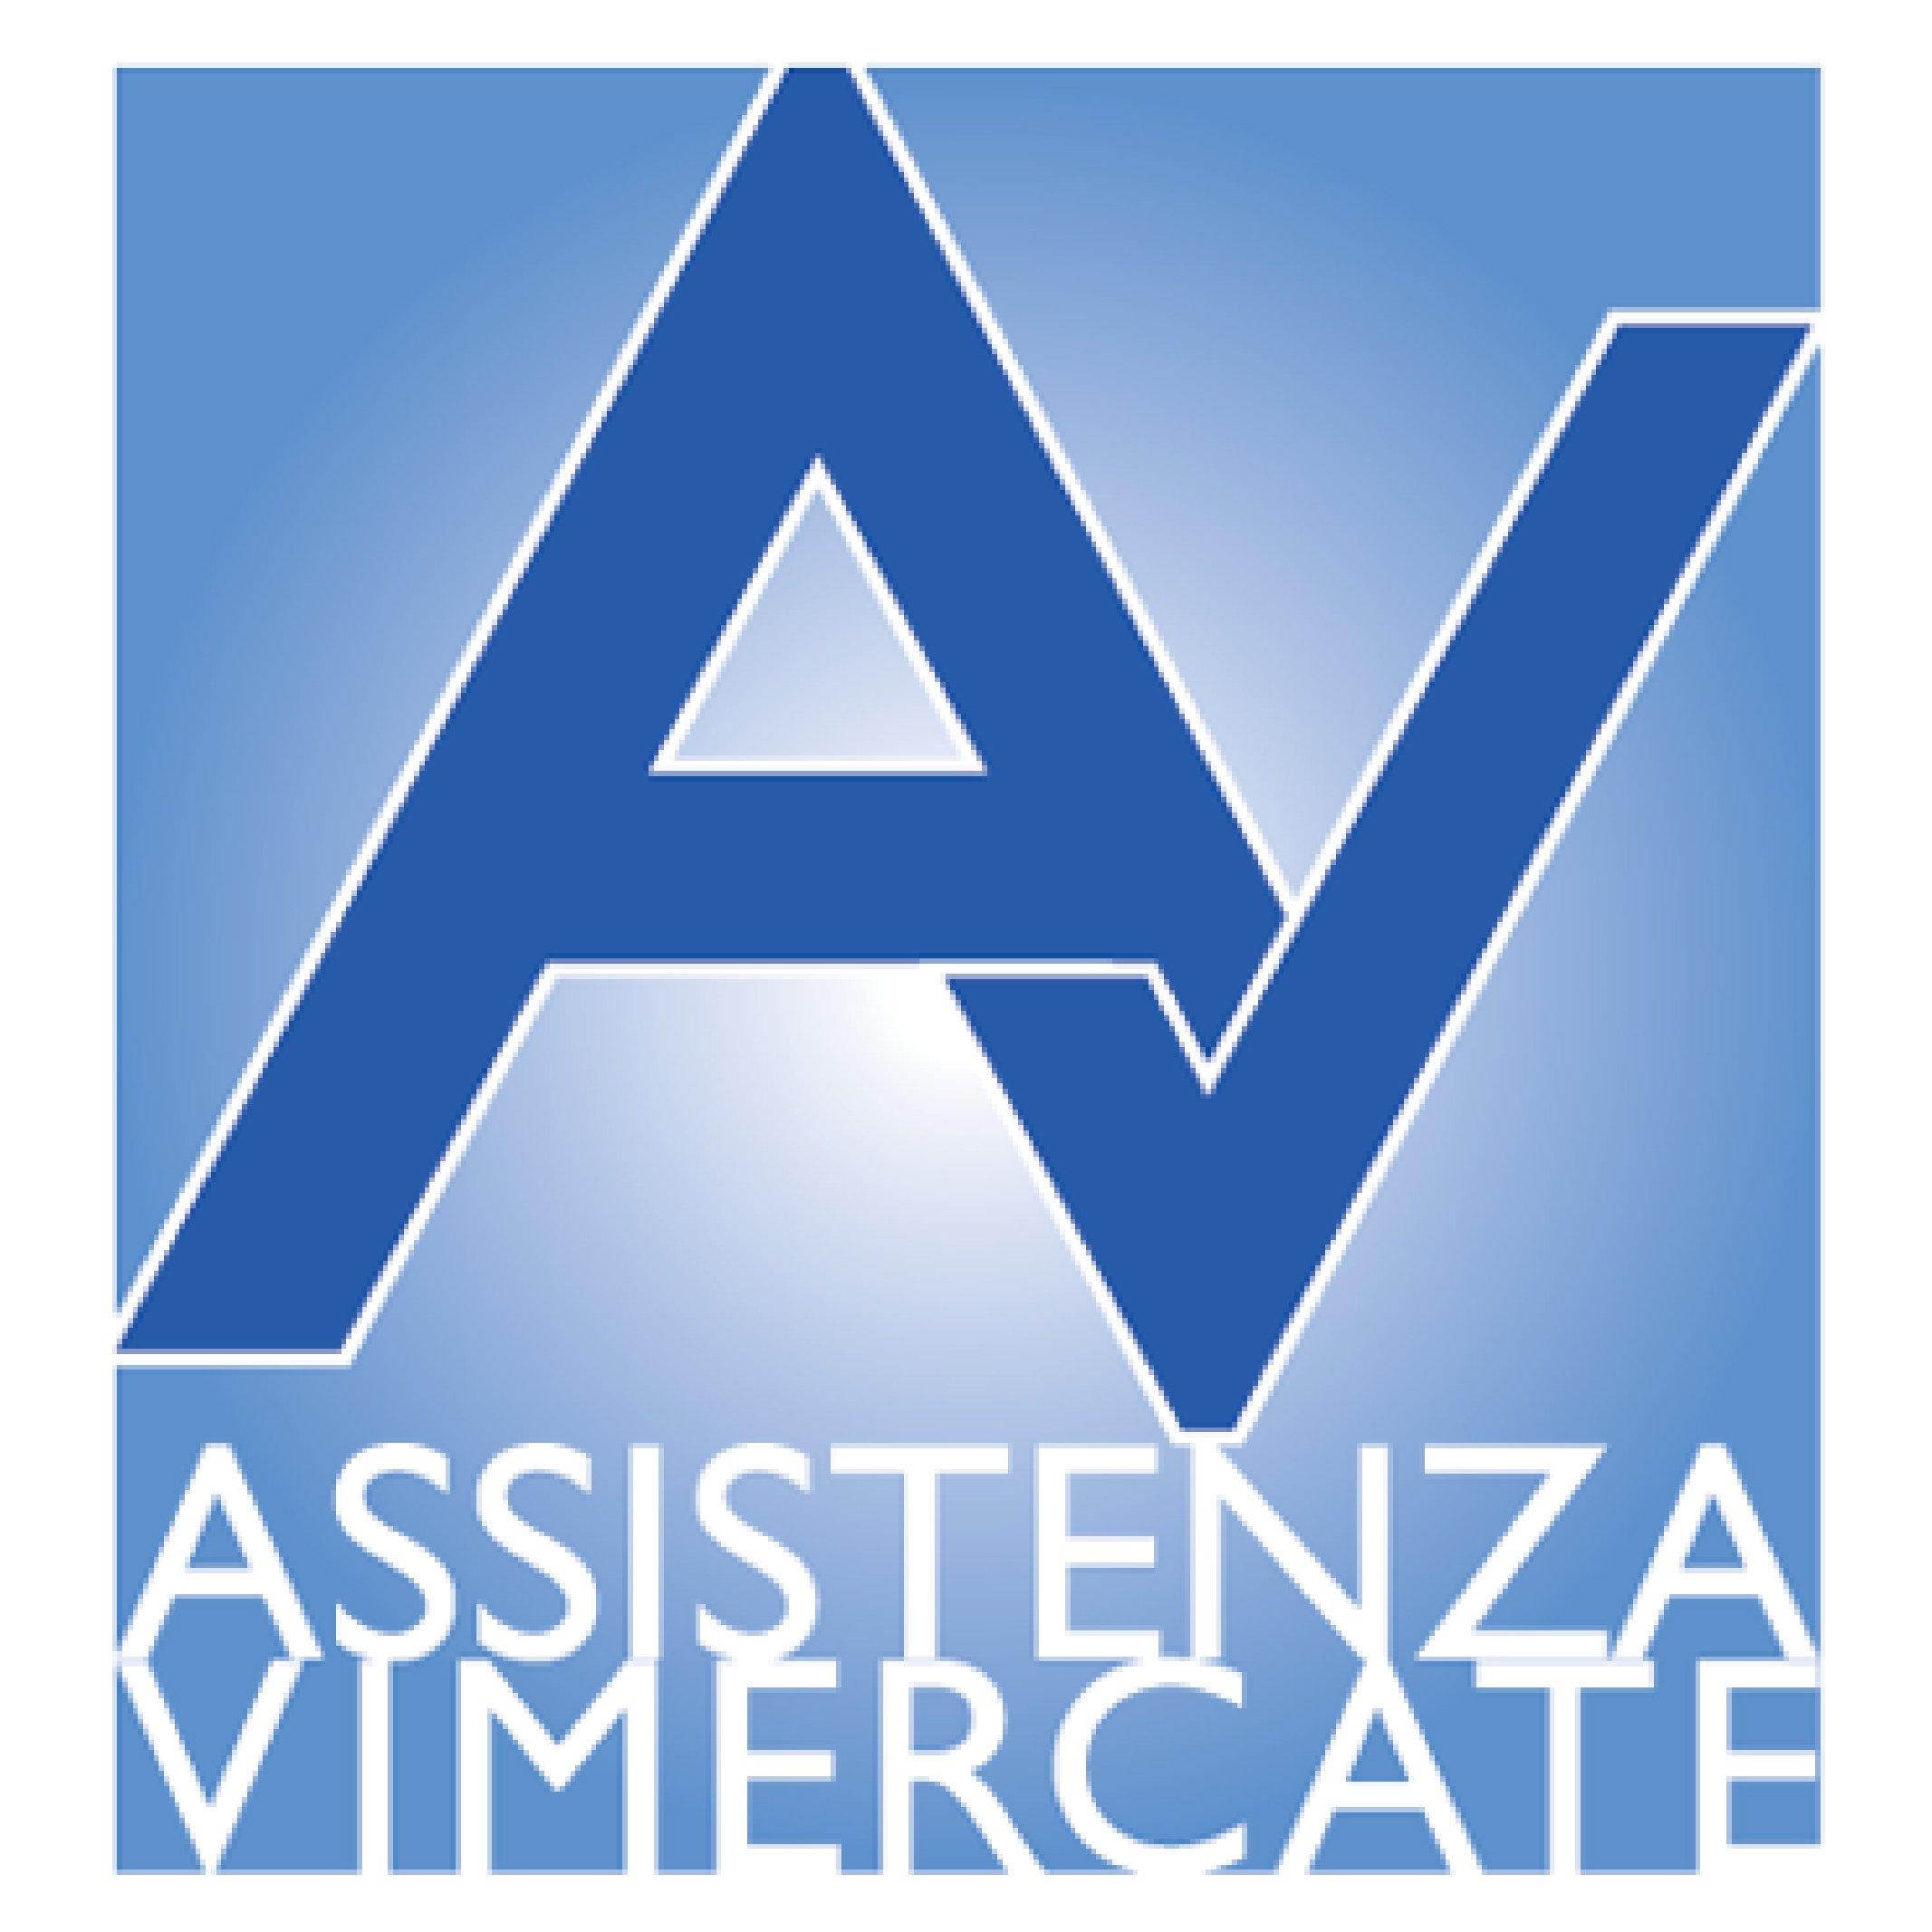 Assistenza Vimercate